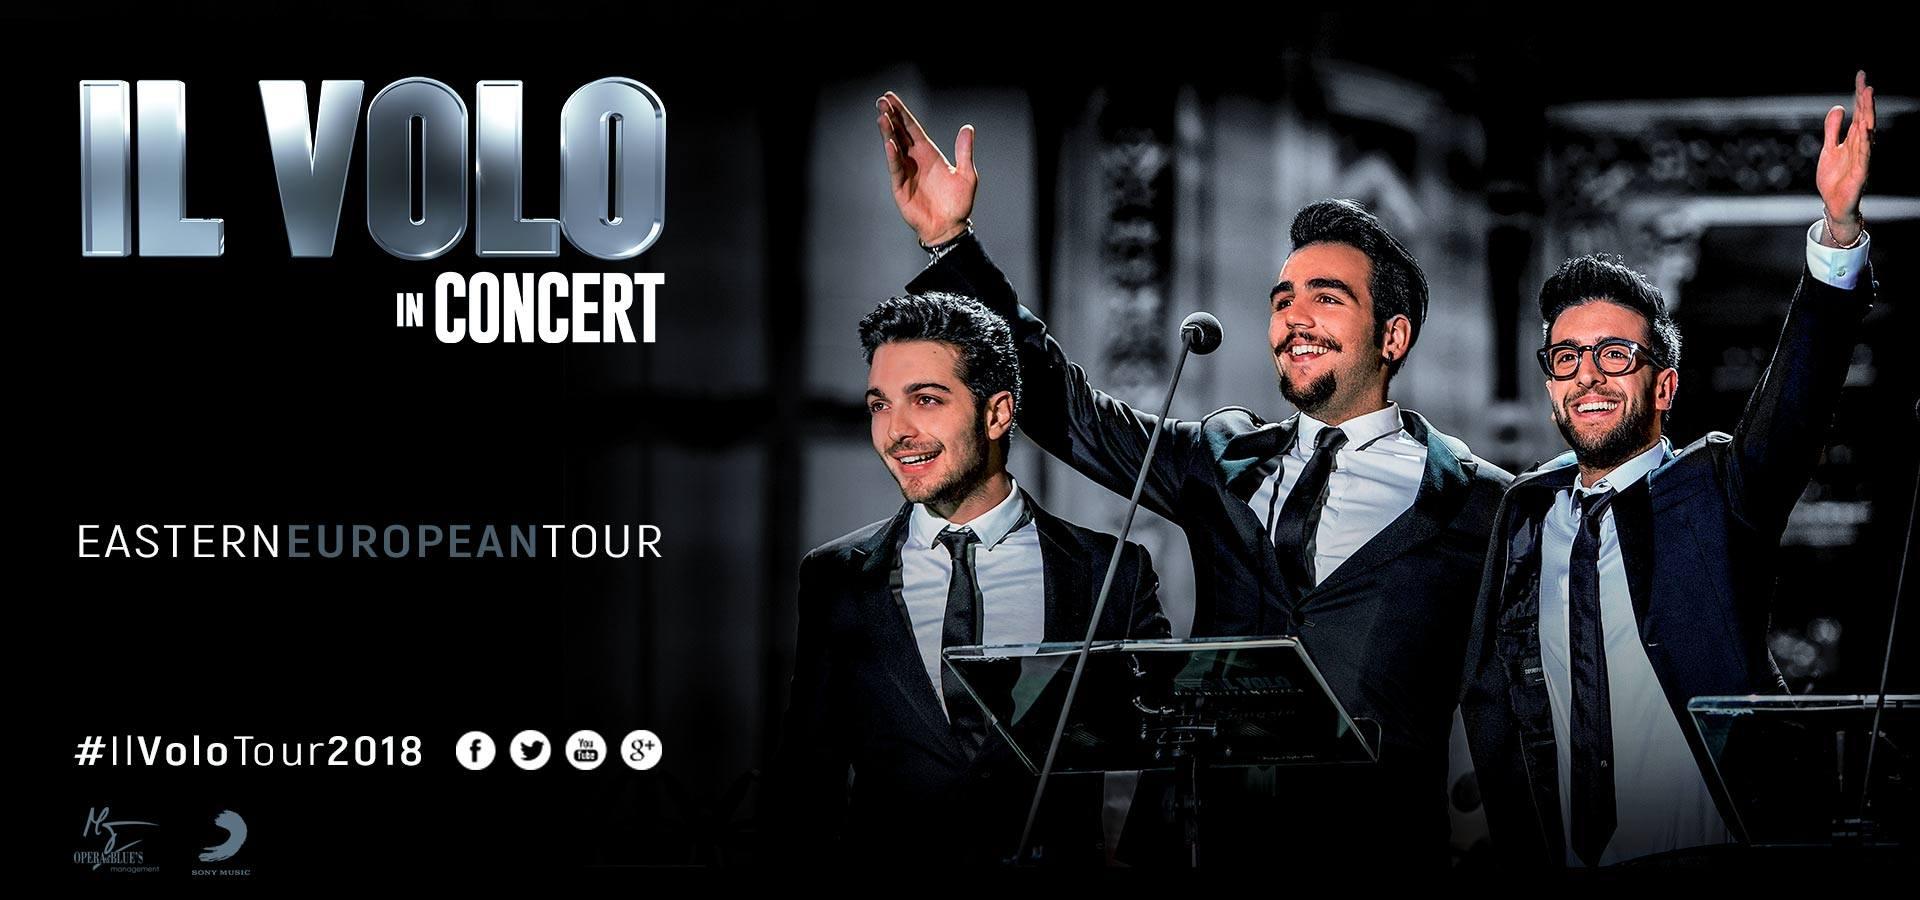 VIDEO: Talijanska grupa 'Il Volo' nastavlja europsku turneju